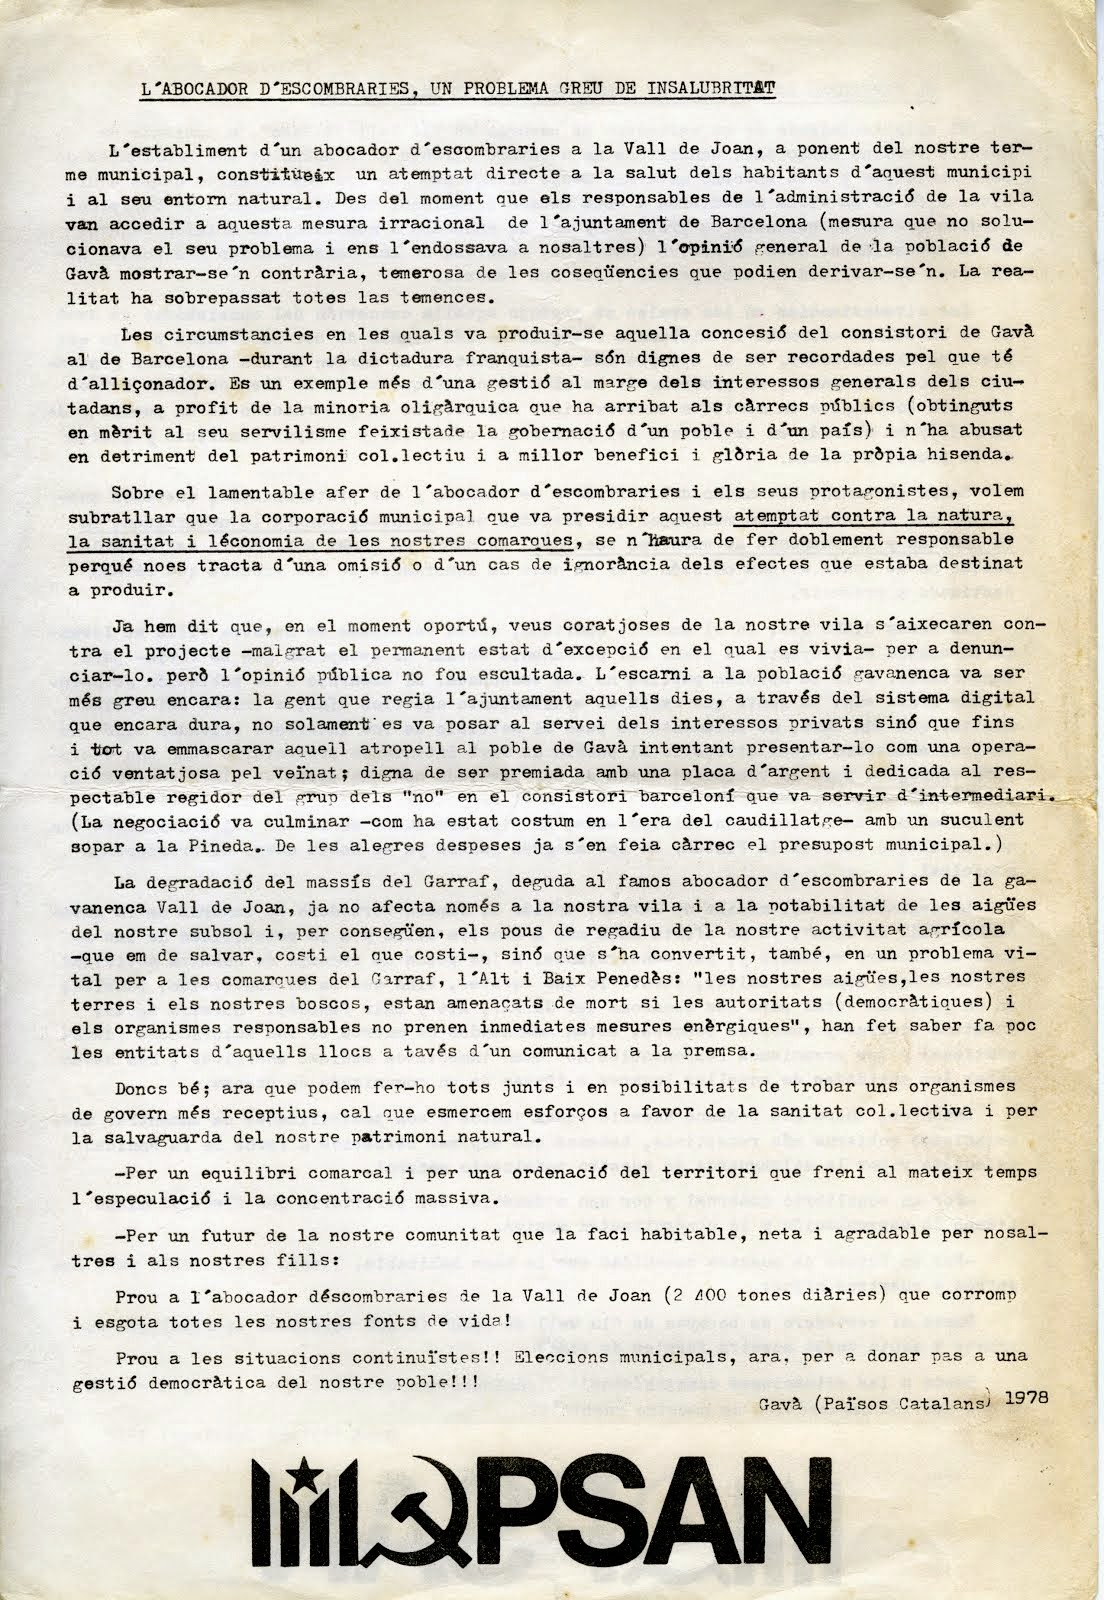 Manifest del PSAN Gavà any 1978